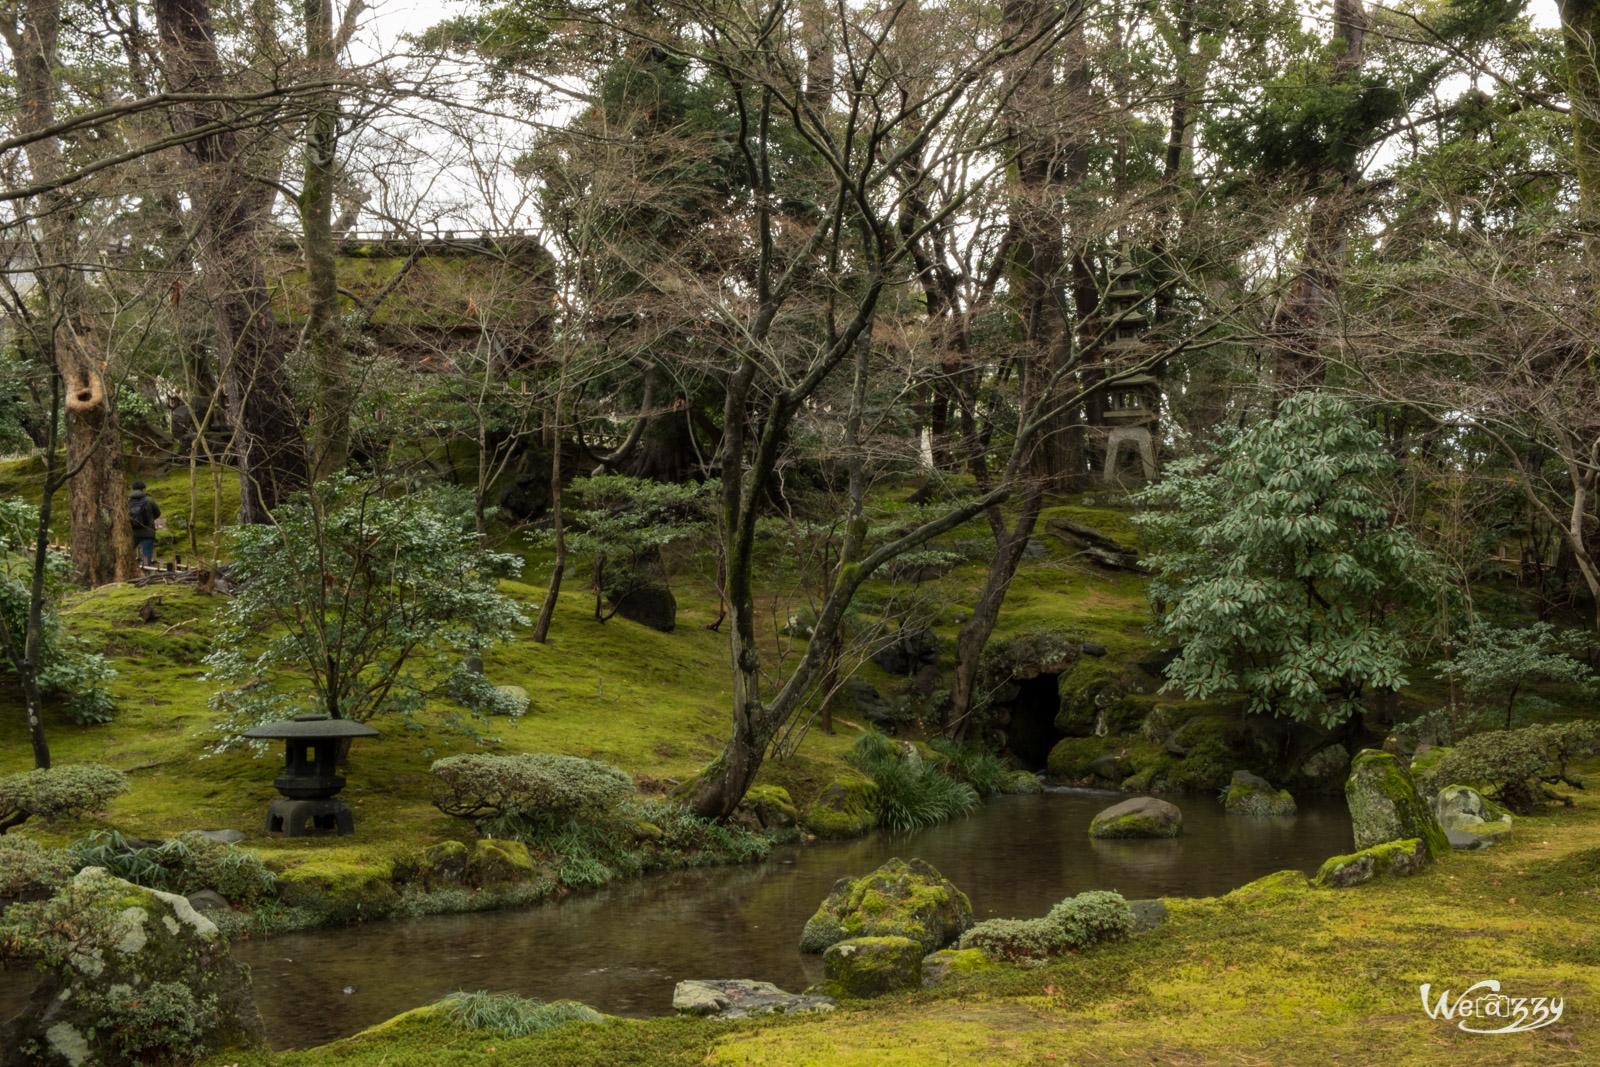 Japon, Kanazawa, Voyage, jardin japonais